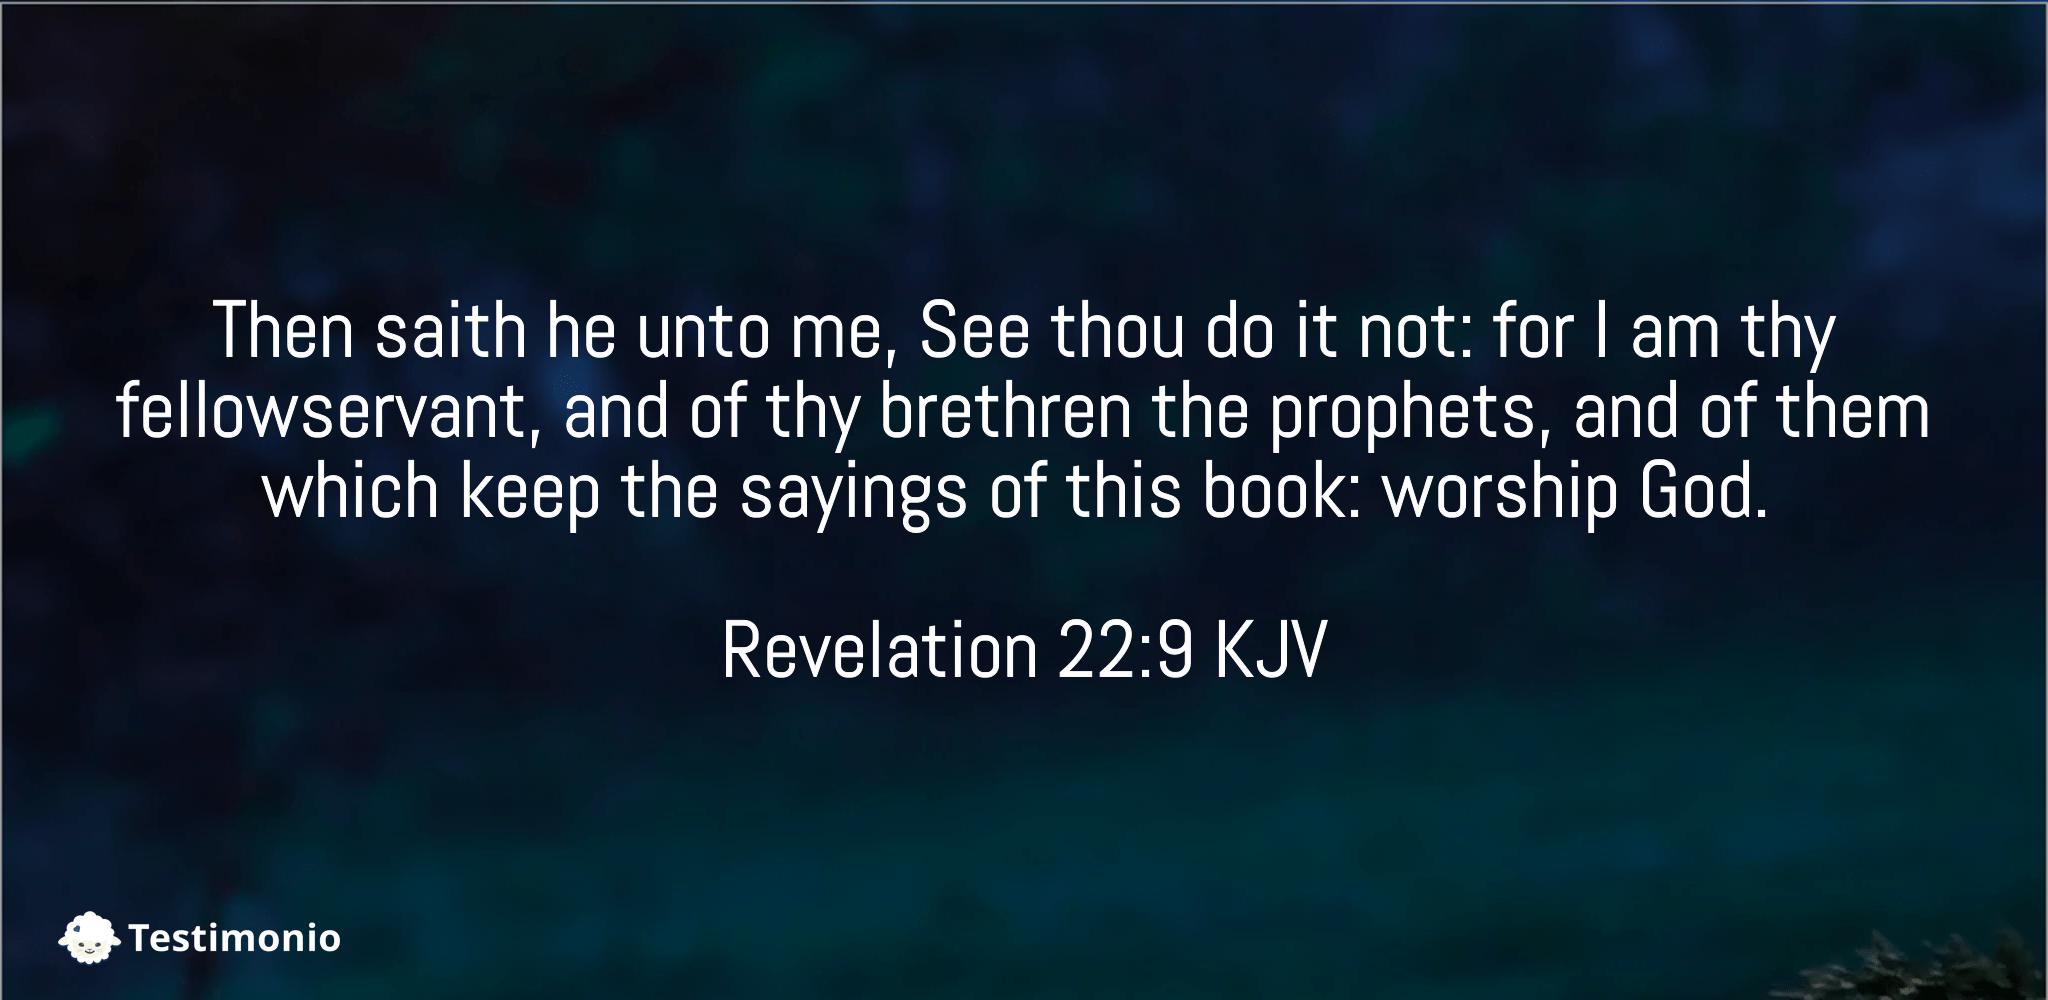 Revelation 22:9